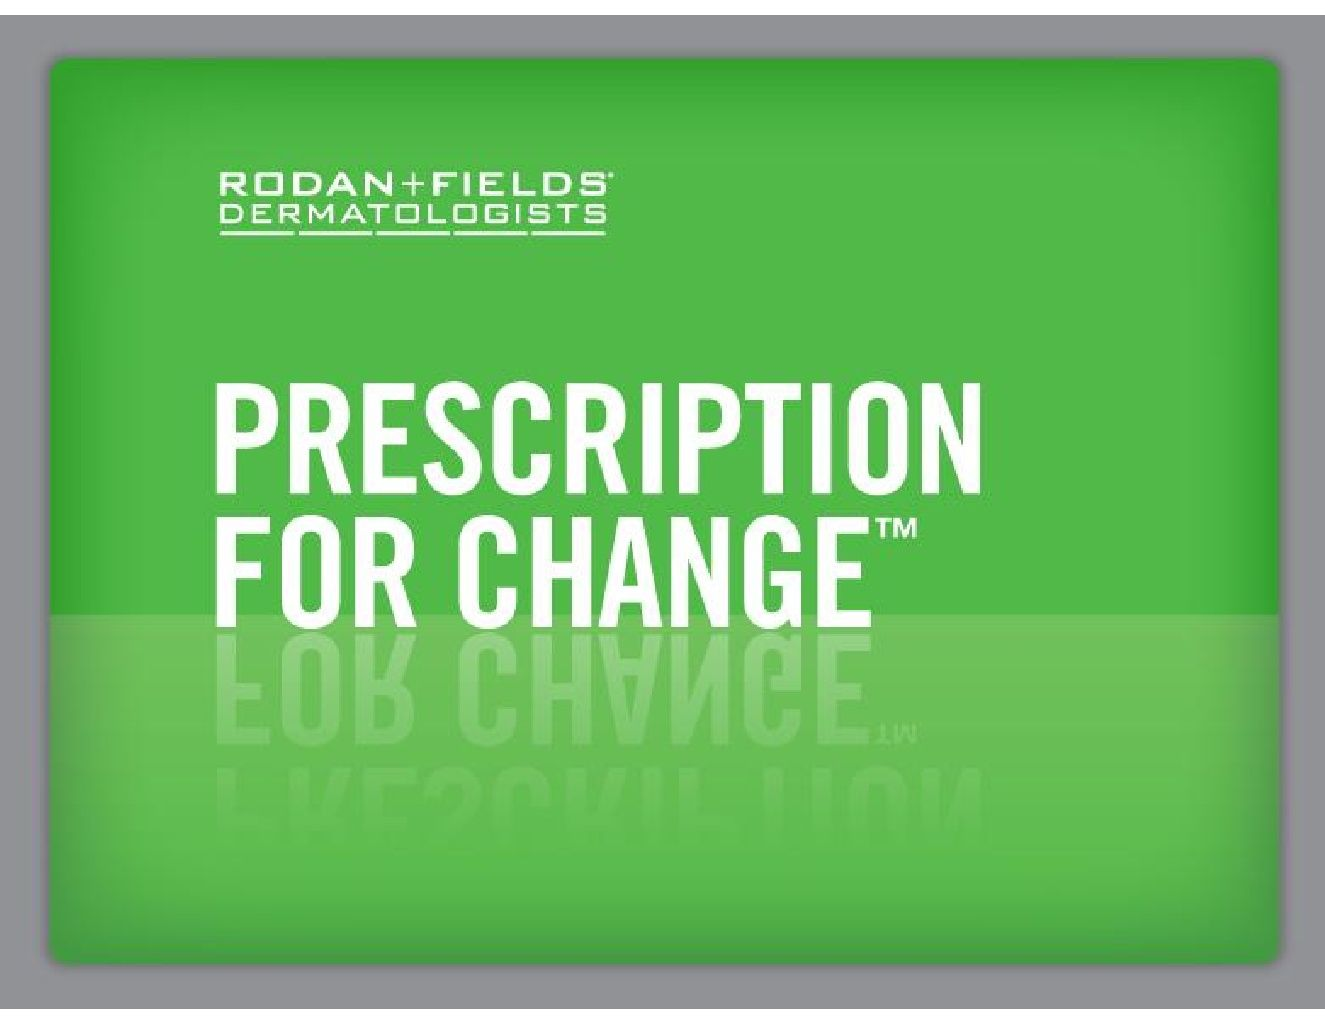 Rodan + Fields Business System Powerpoint Presentation by